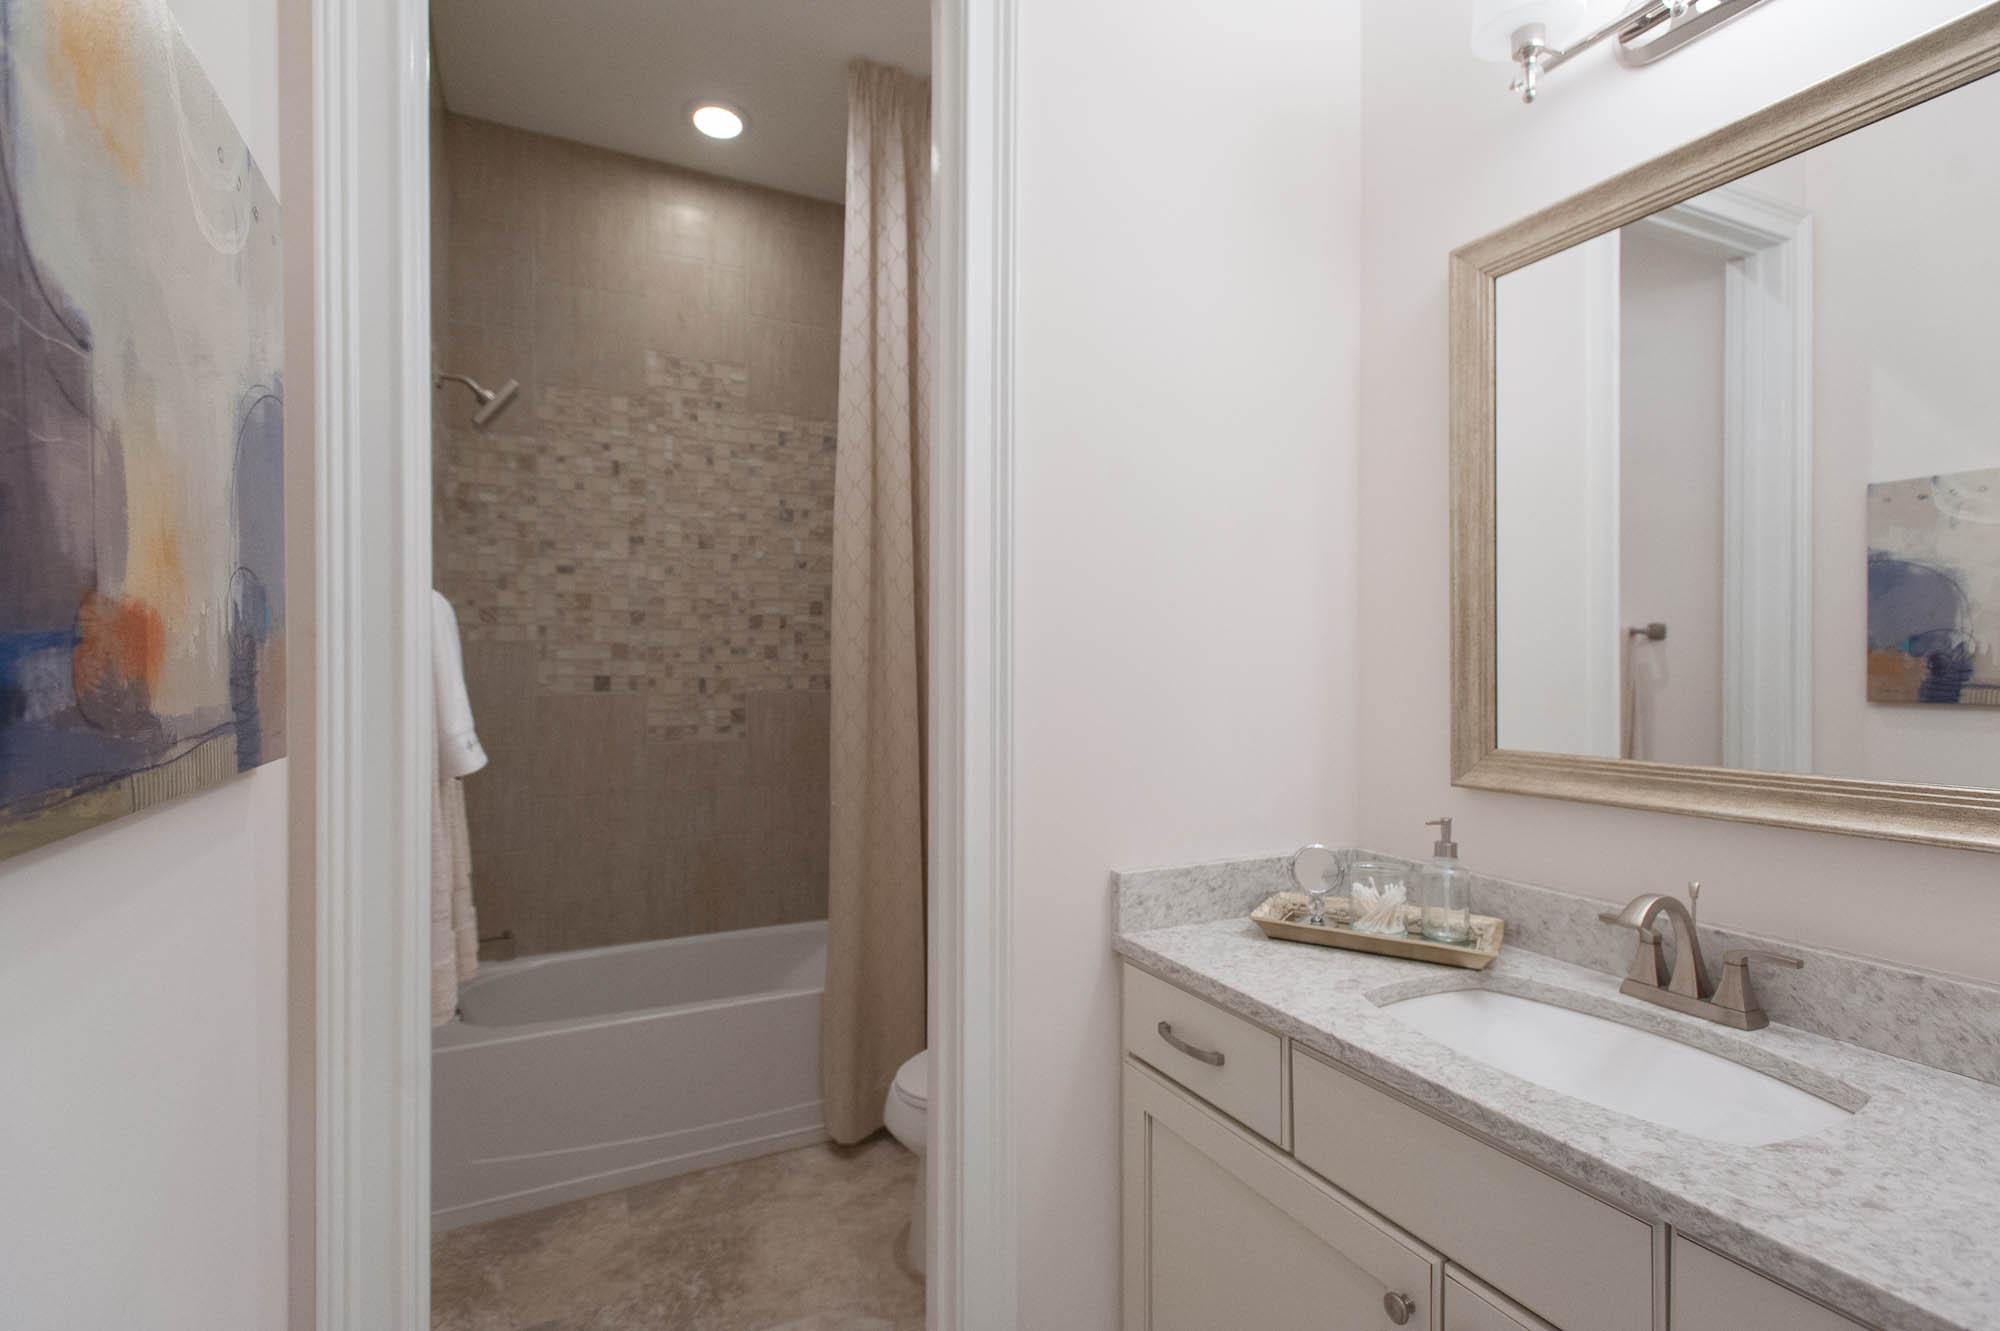 sterling-lennar-celestina-st johns-florida-nefba-northeast florida-southeastern united states-residential interior design--contemporary-bathroom-shower-tile-master-owners-ada.jpg